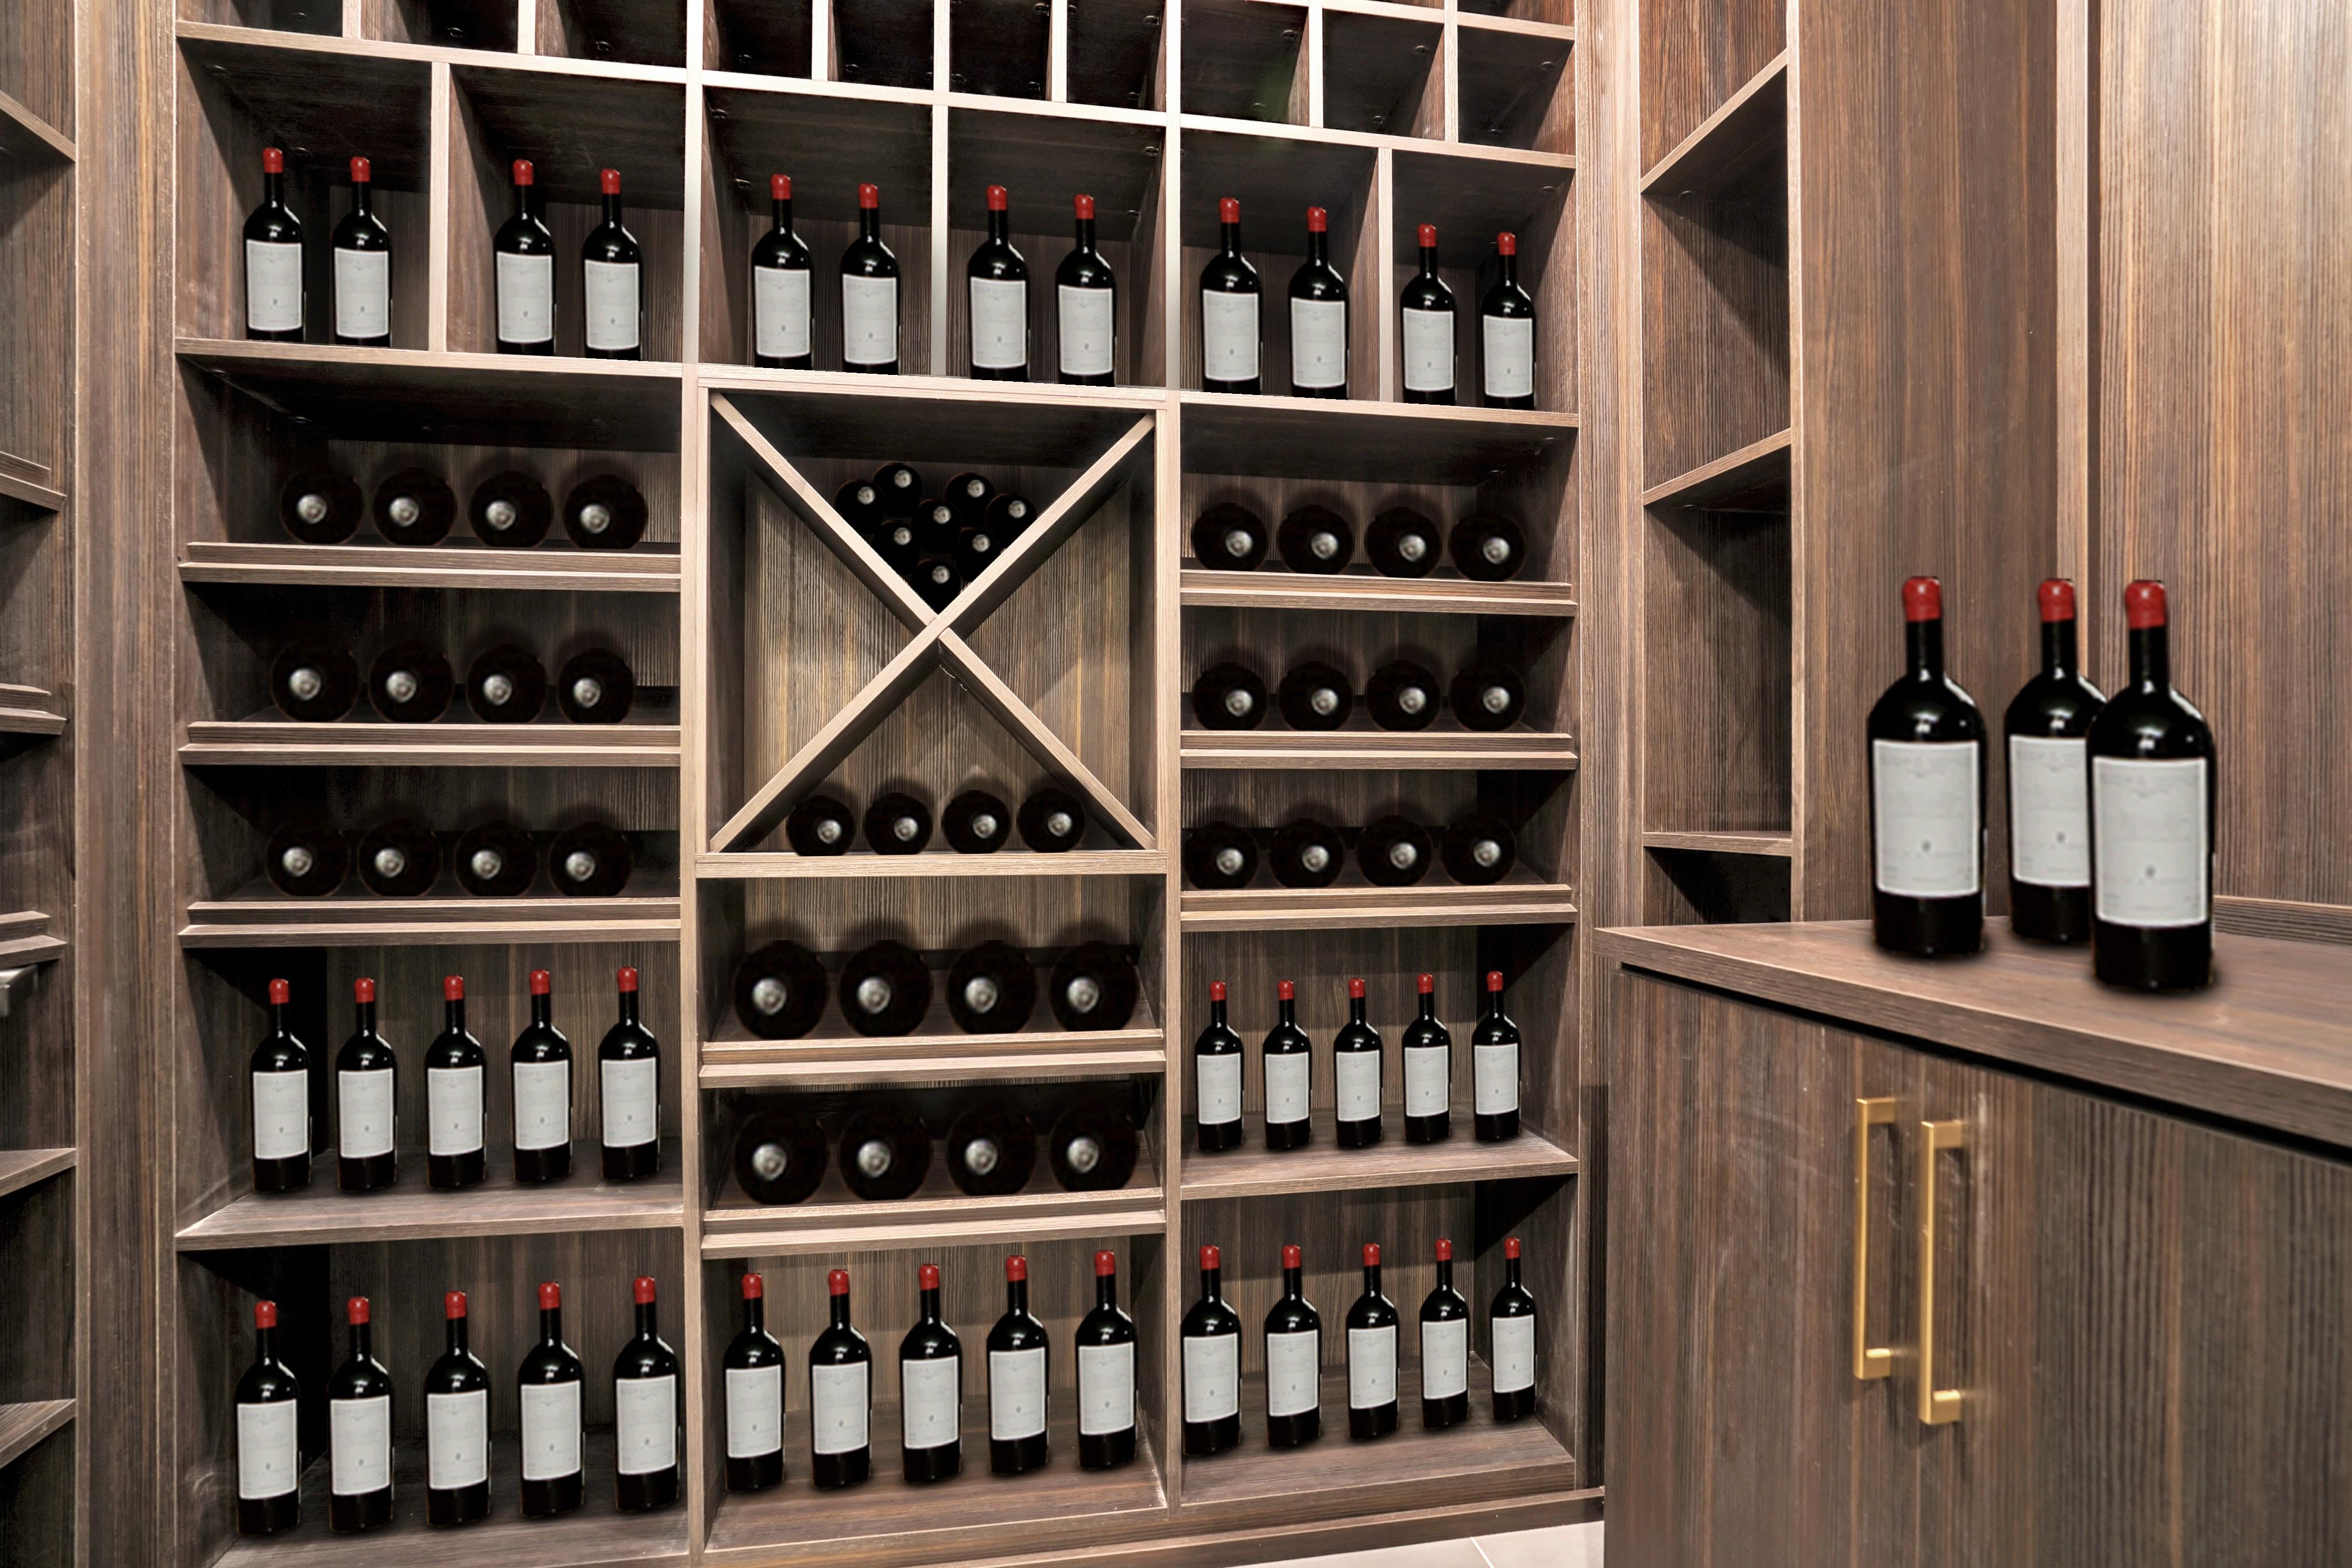 281 Hartshorn Drive Lower Level Wine Cellar